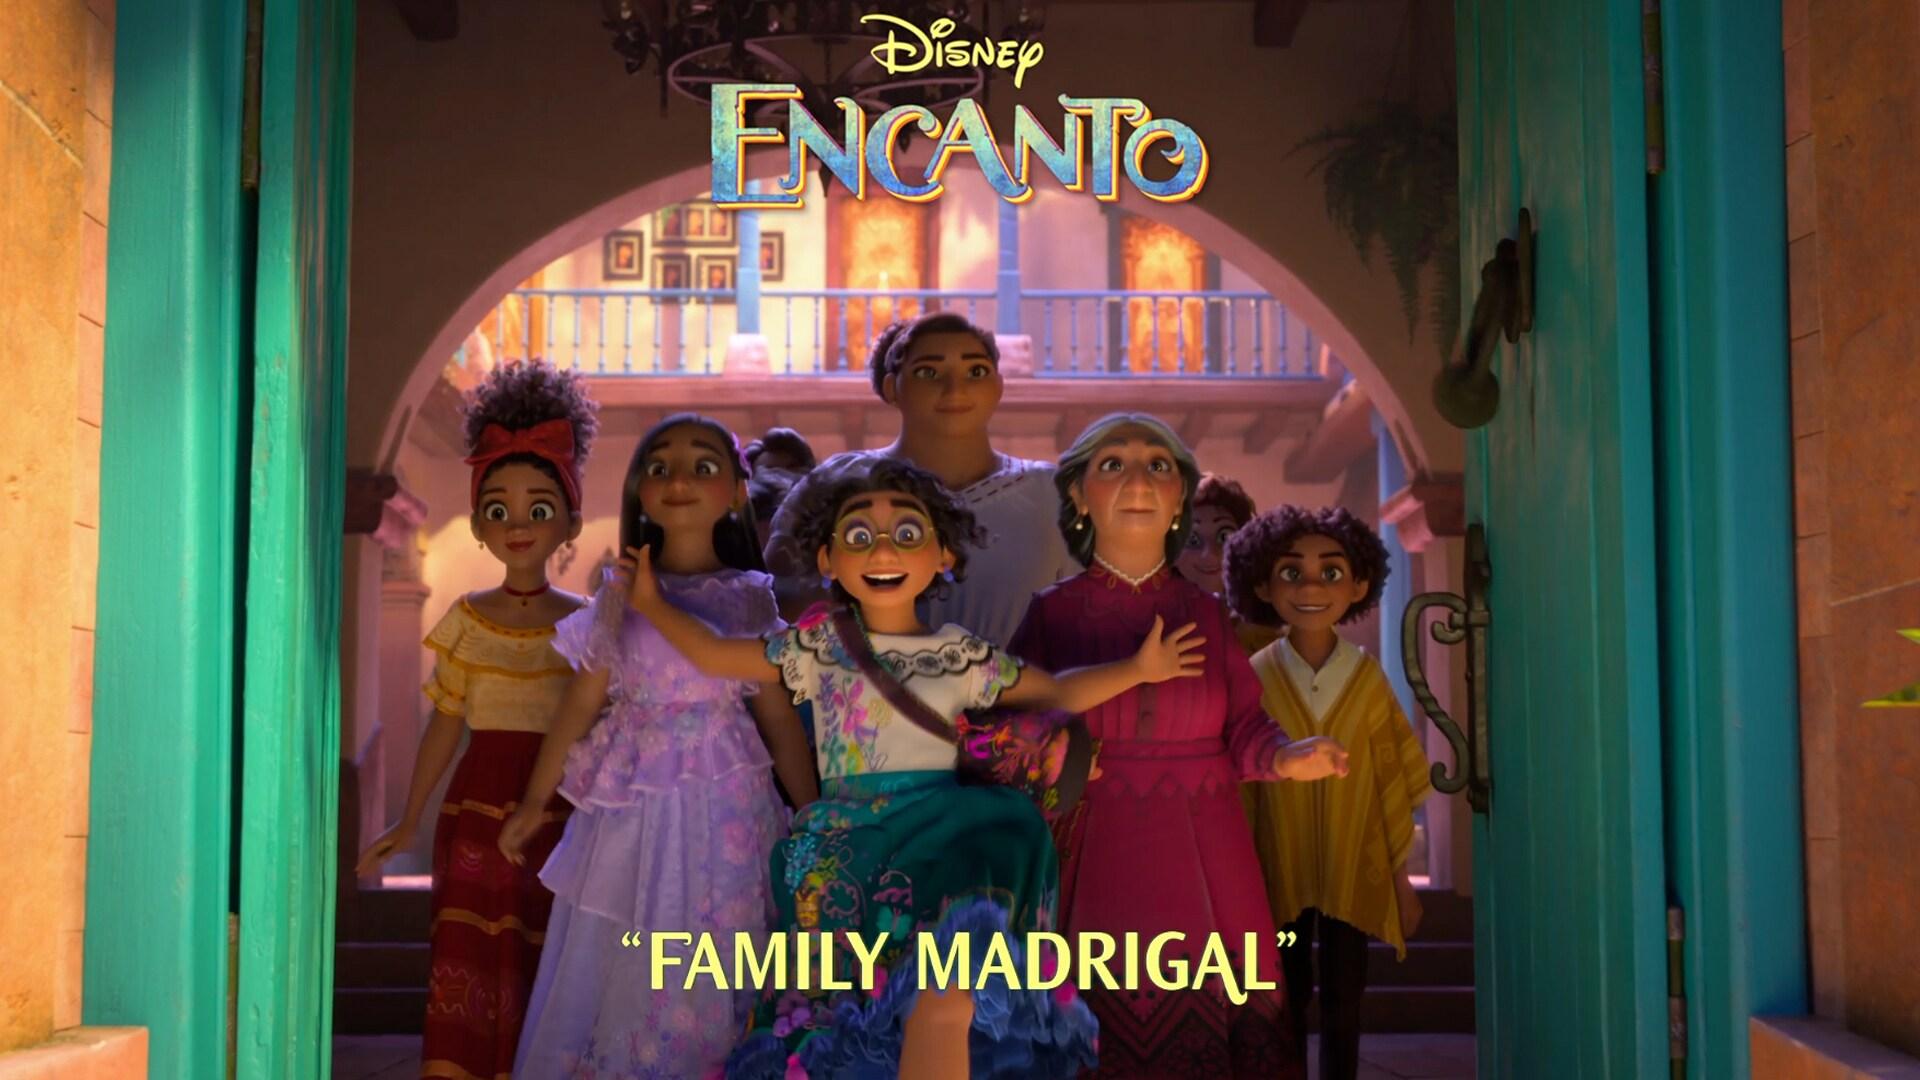 Family Madrigal